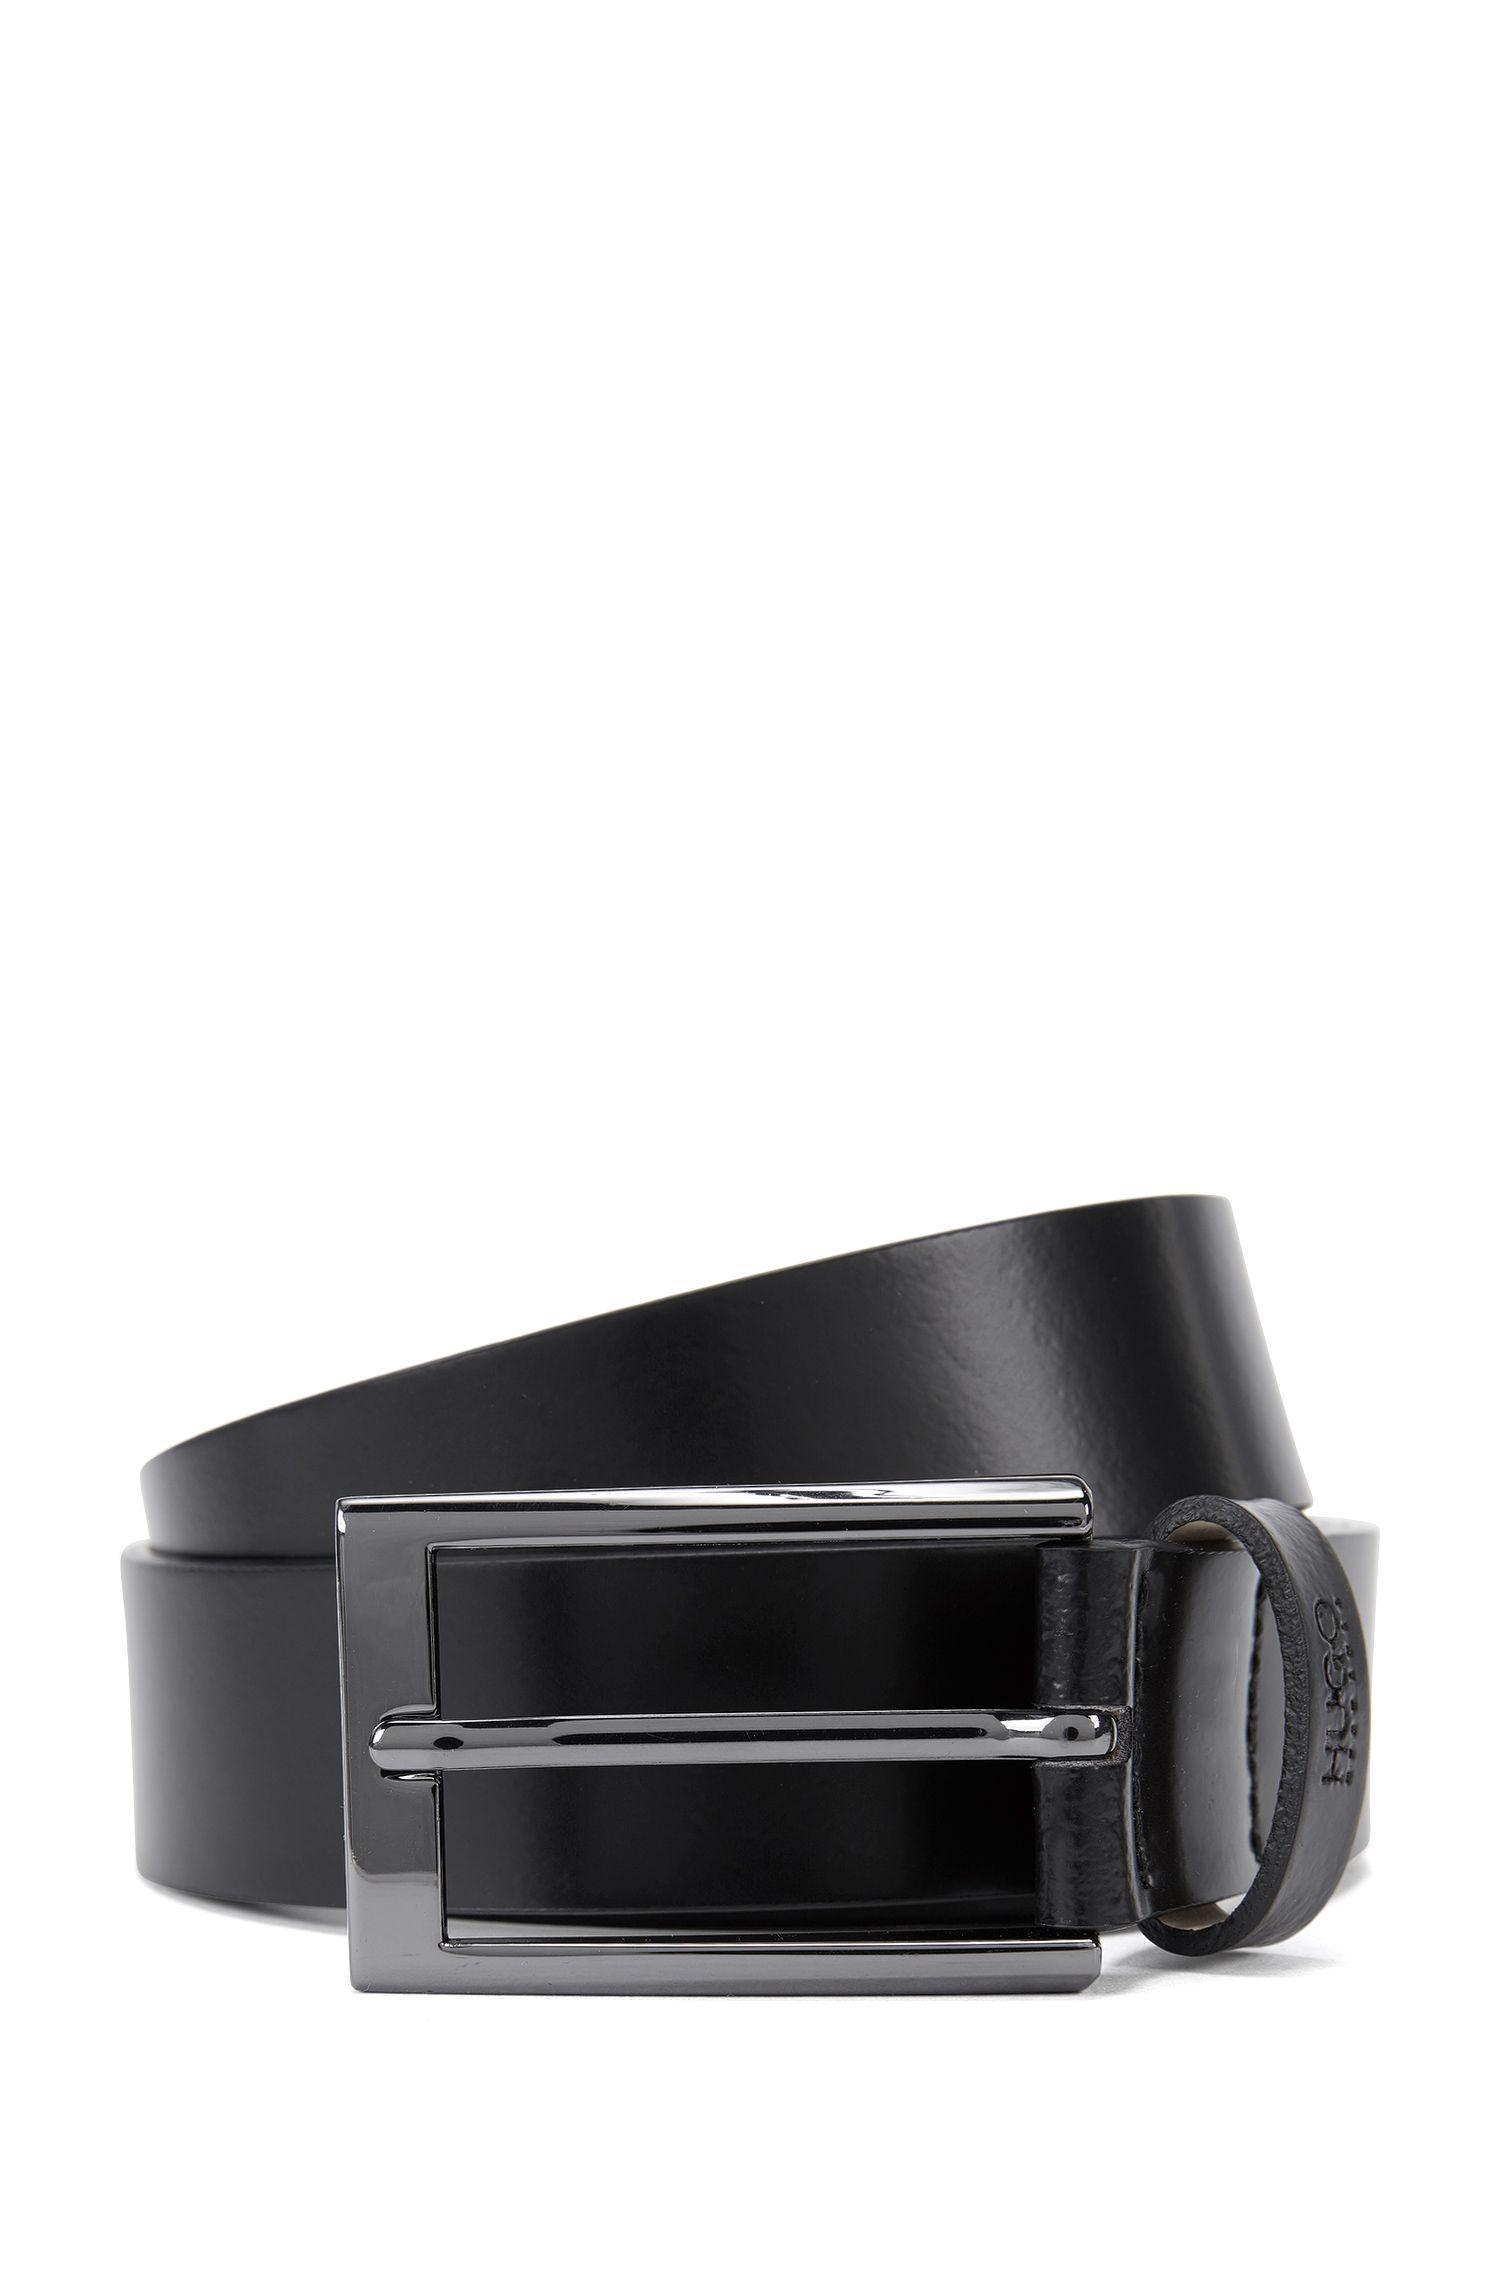 Leather belt with gunmetal hardware